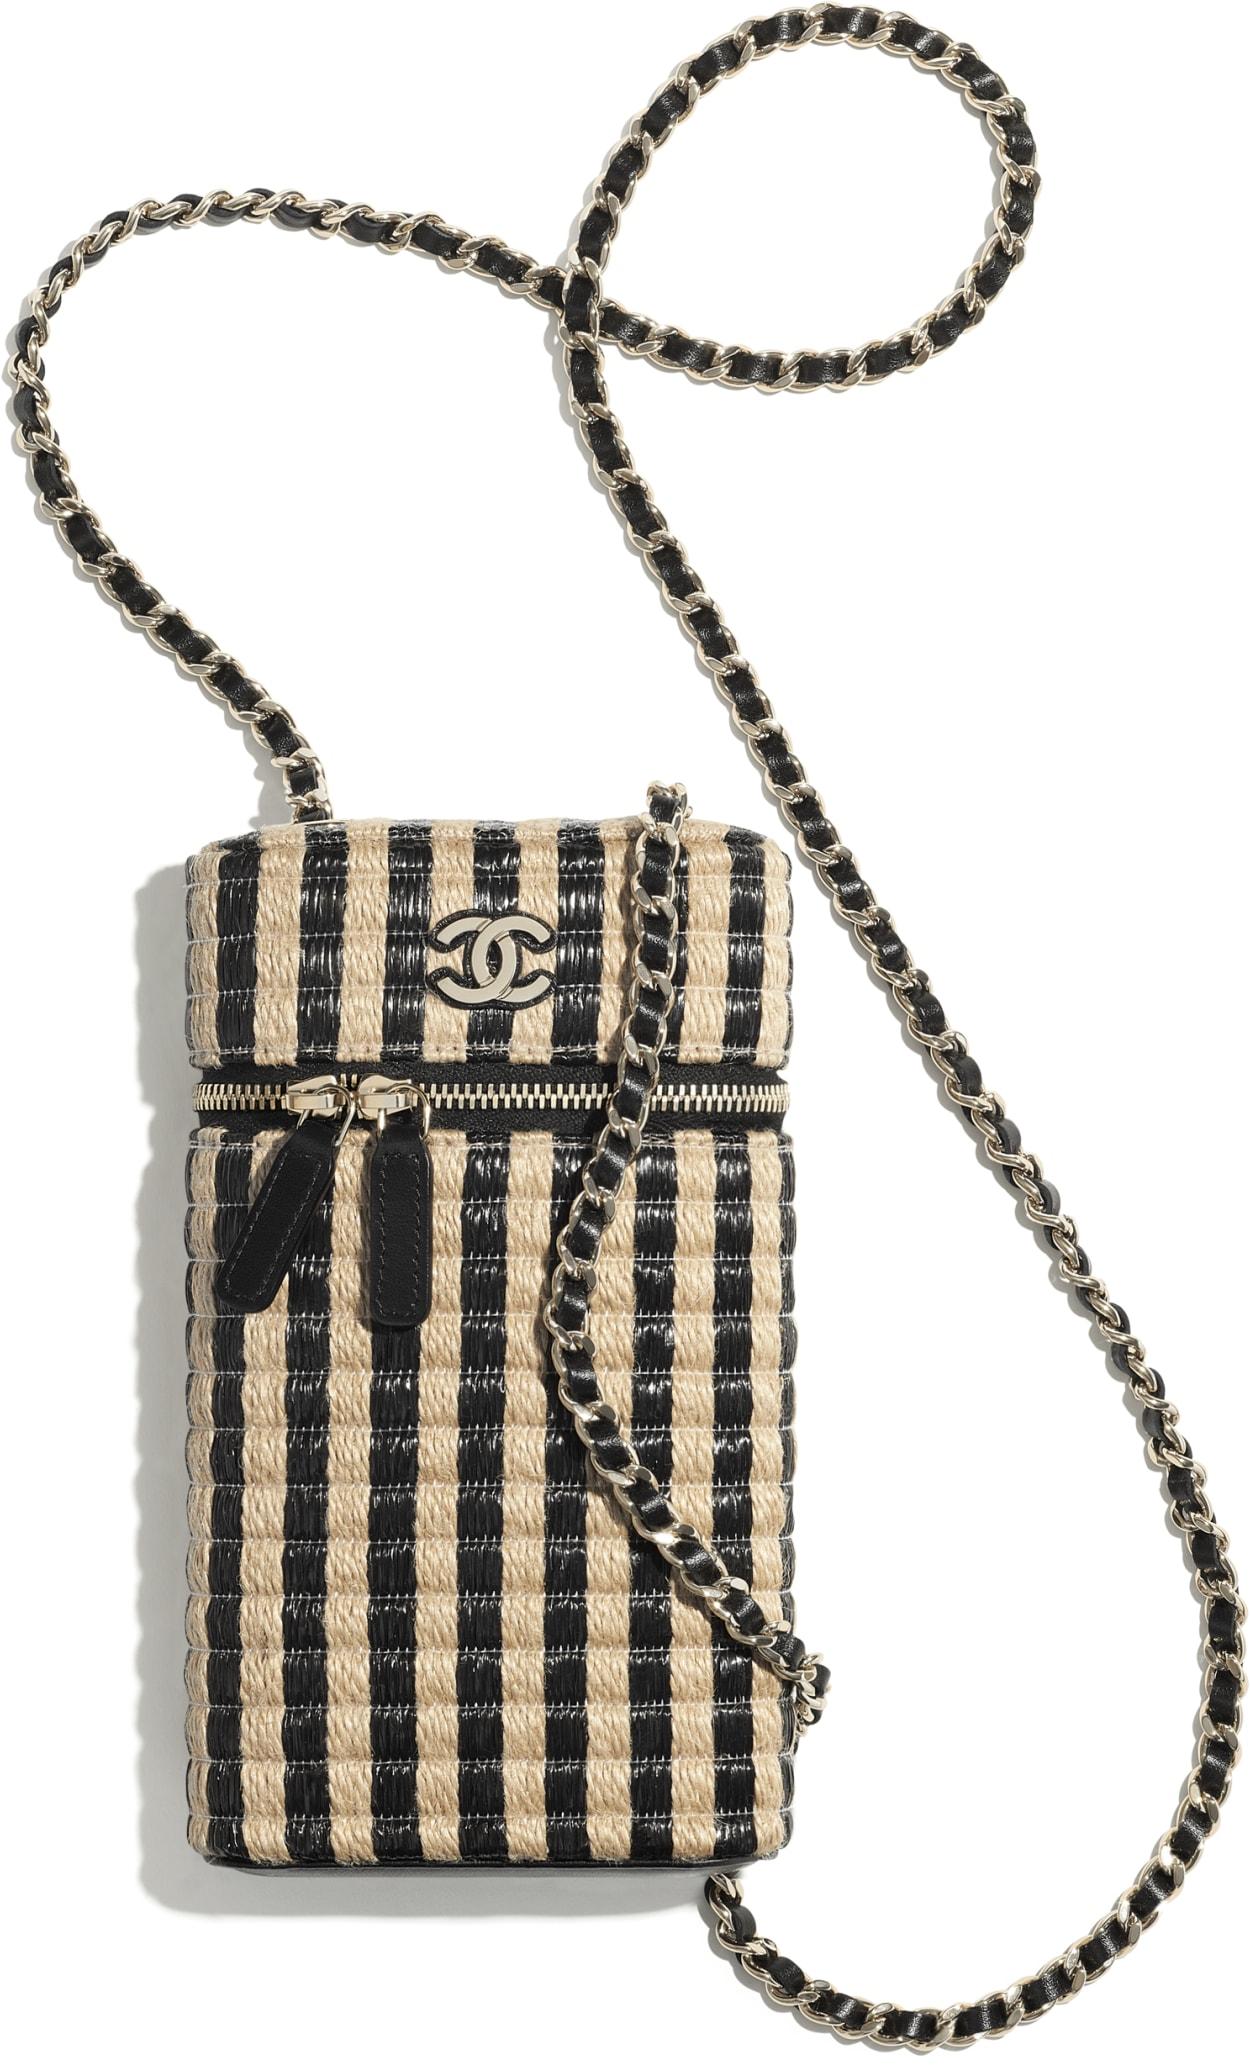 Vanity Phone Holder with Chain